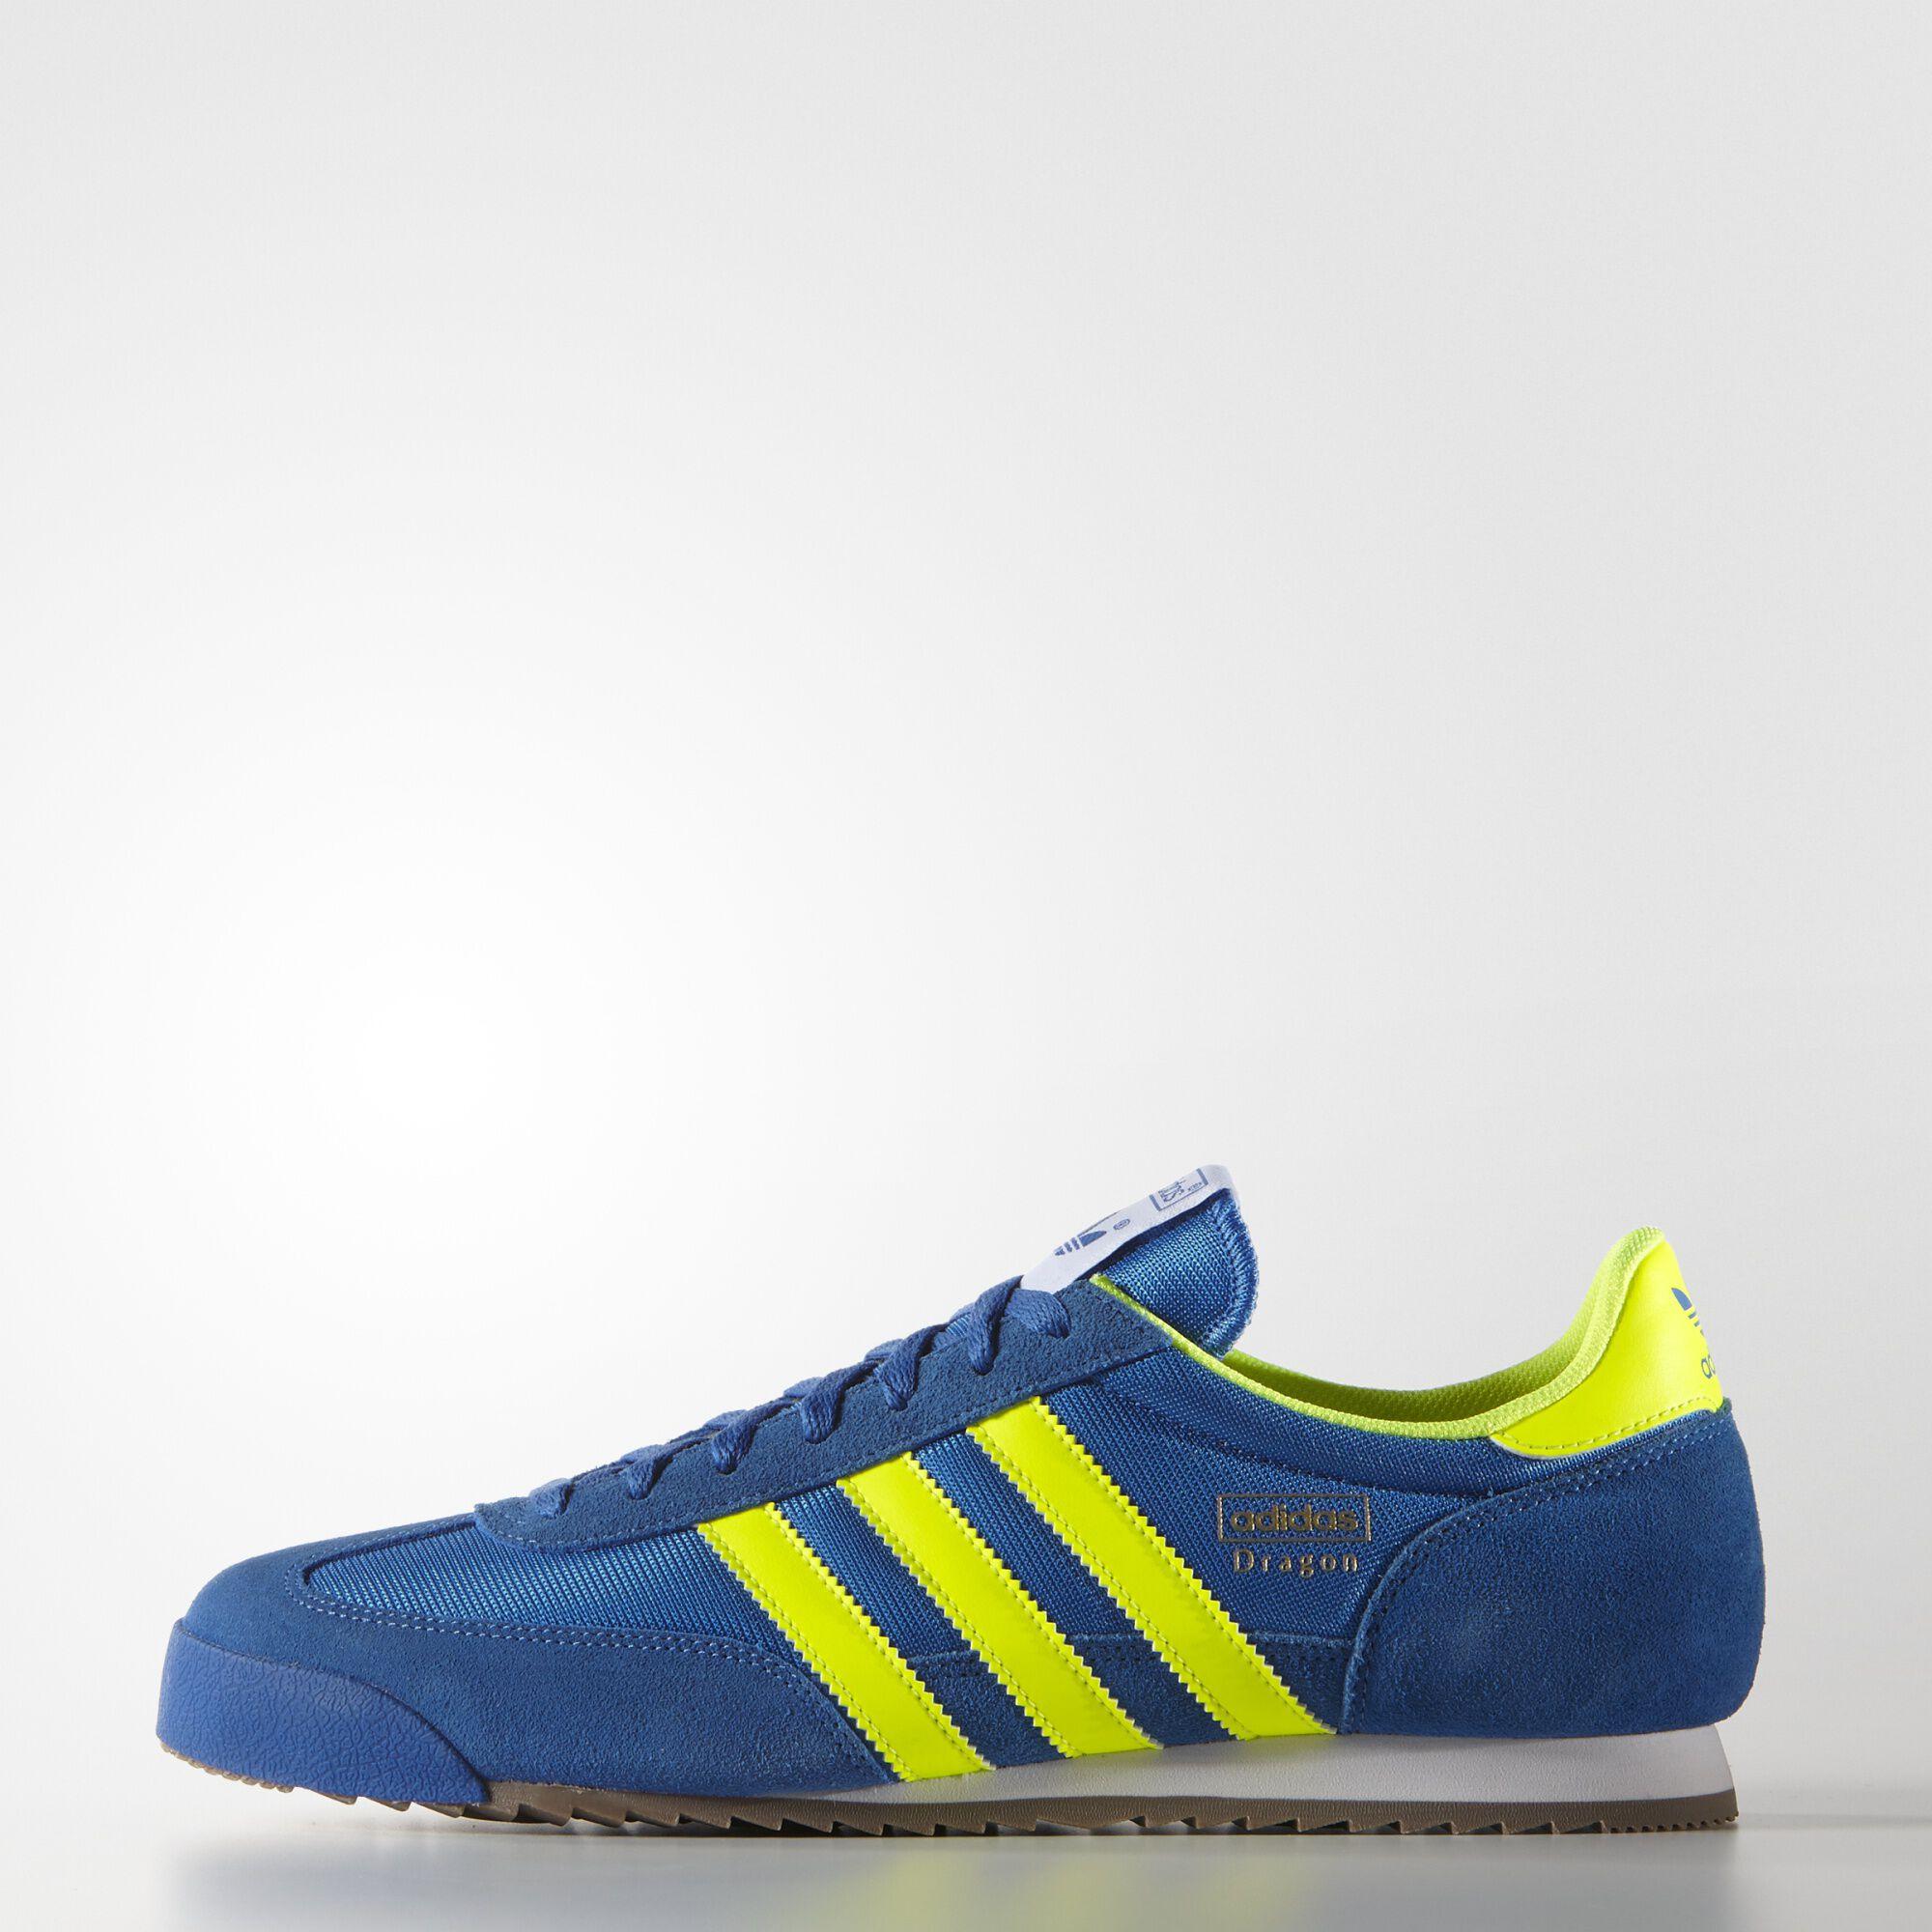 adidas dragon azules y amarillas